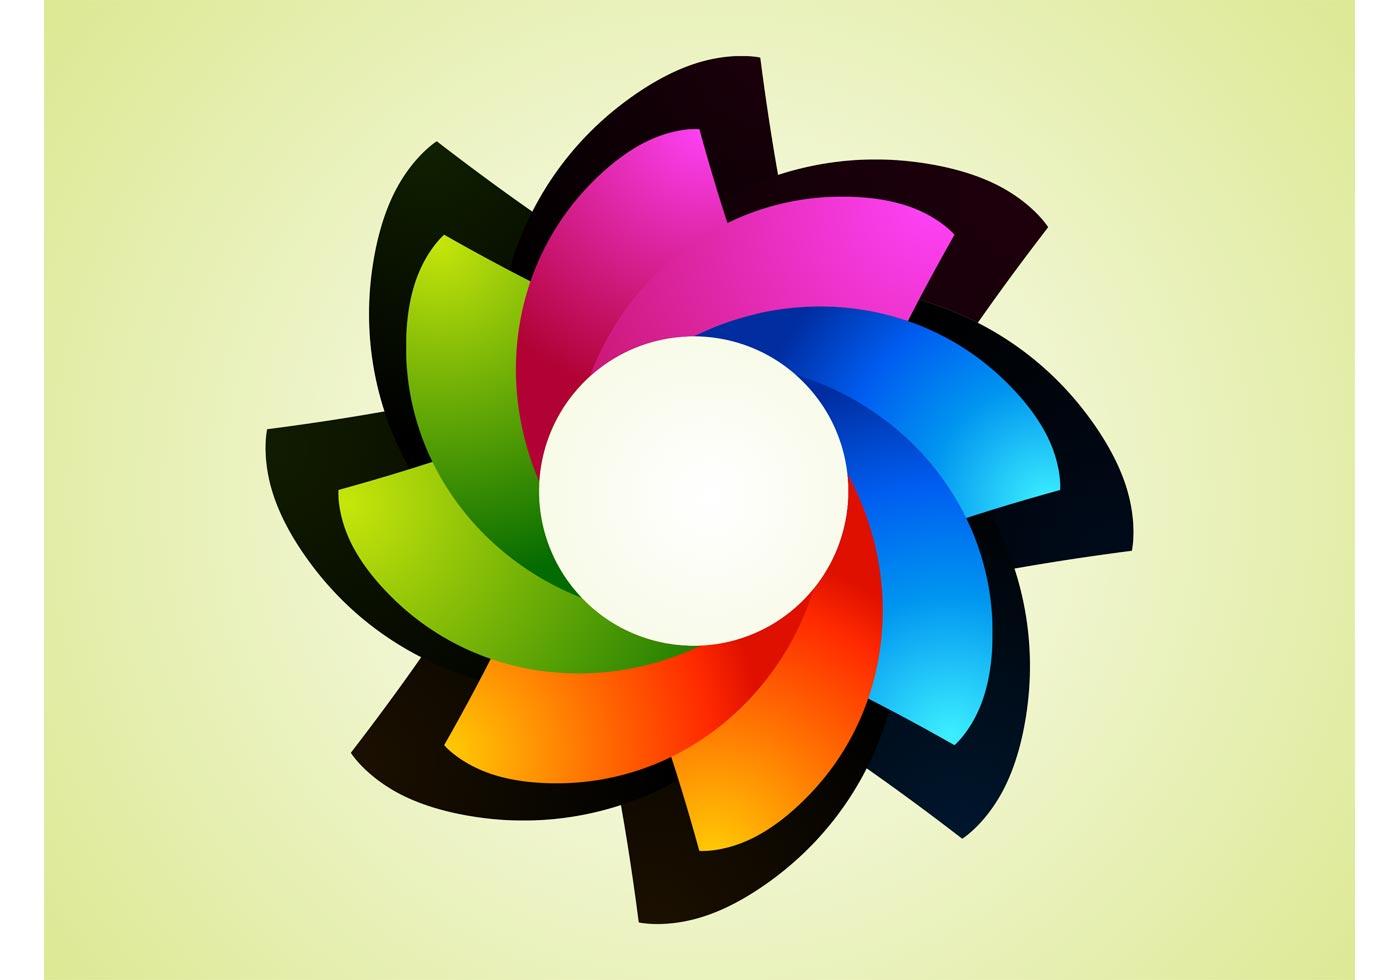 Rainbow Flower Logo - Download Free Vector Art, Stock ... | 1400 x 980 jpeg 56kB